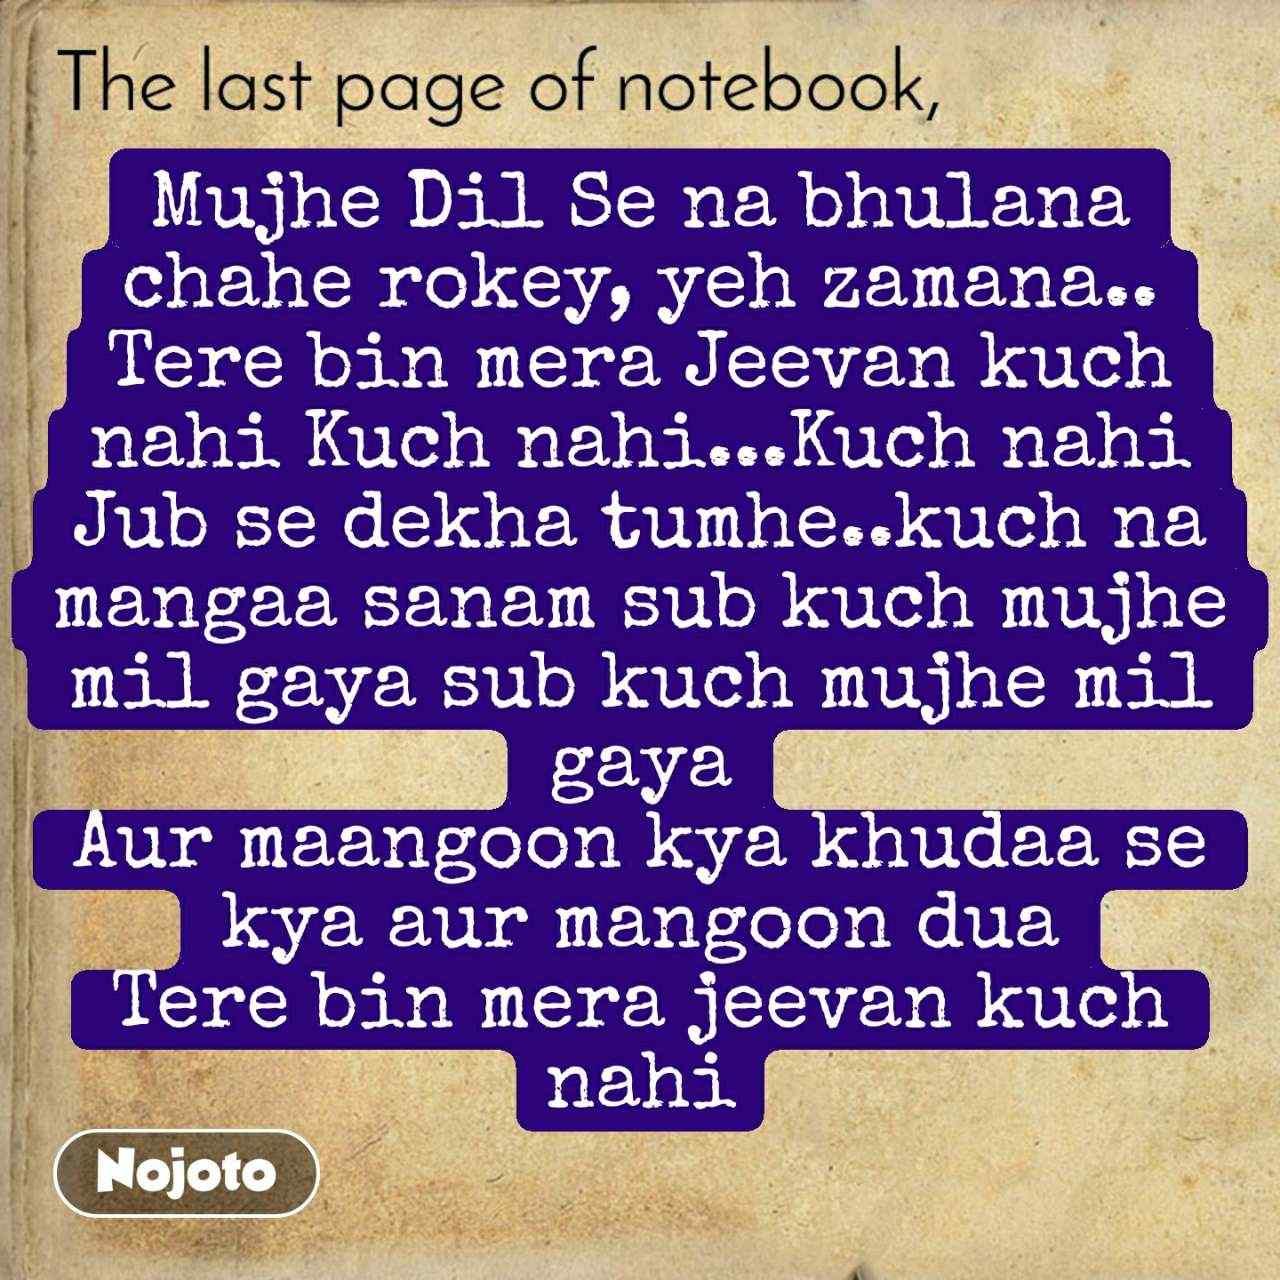 The last page of notebook Mujhe Dil Se na bhulana chahe rokey, yeh zamana.. Tere bin mera Jeevan kuch nahi Kuch nahi...Kuch nahi Jub se dekha tumhe..kuch na mangaa sanam sub kuch mujhe mil gaya sub kuch mujhe mil gaya Aur maangoon kya khudaa se kya aur mangoon dua Tere bin mera jeevan kuch nahi